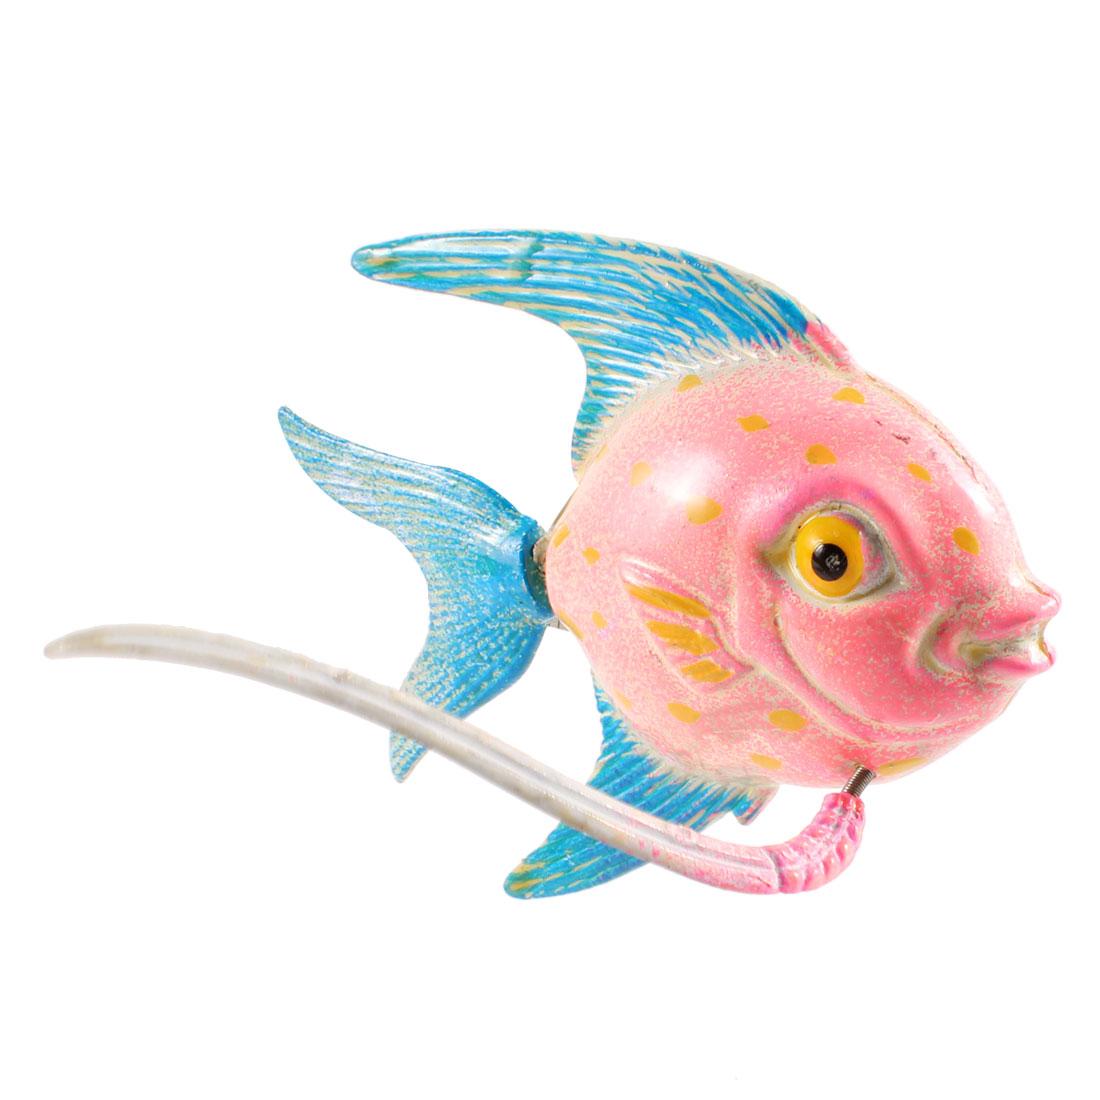 Pink Cyan Plastic Manmade Fish Fridge Magnetic Sticker Ornament